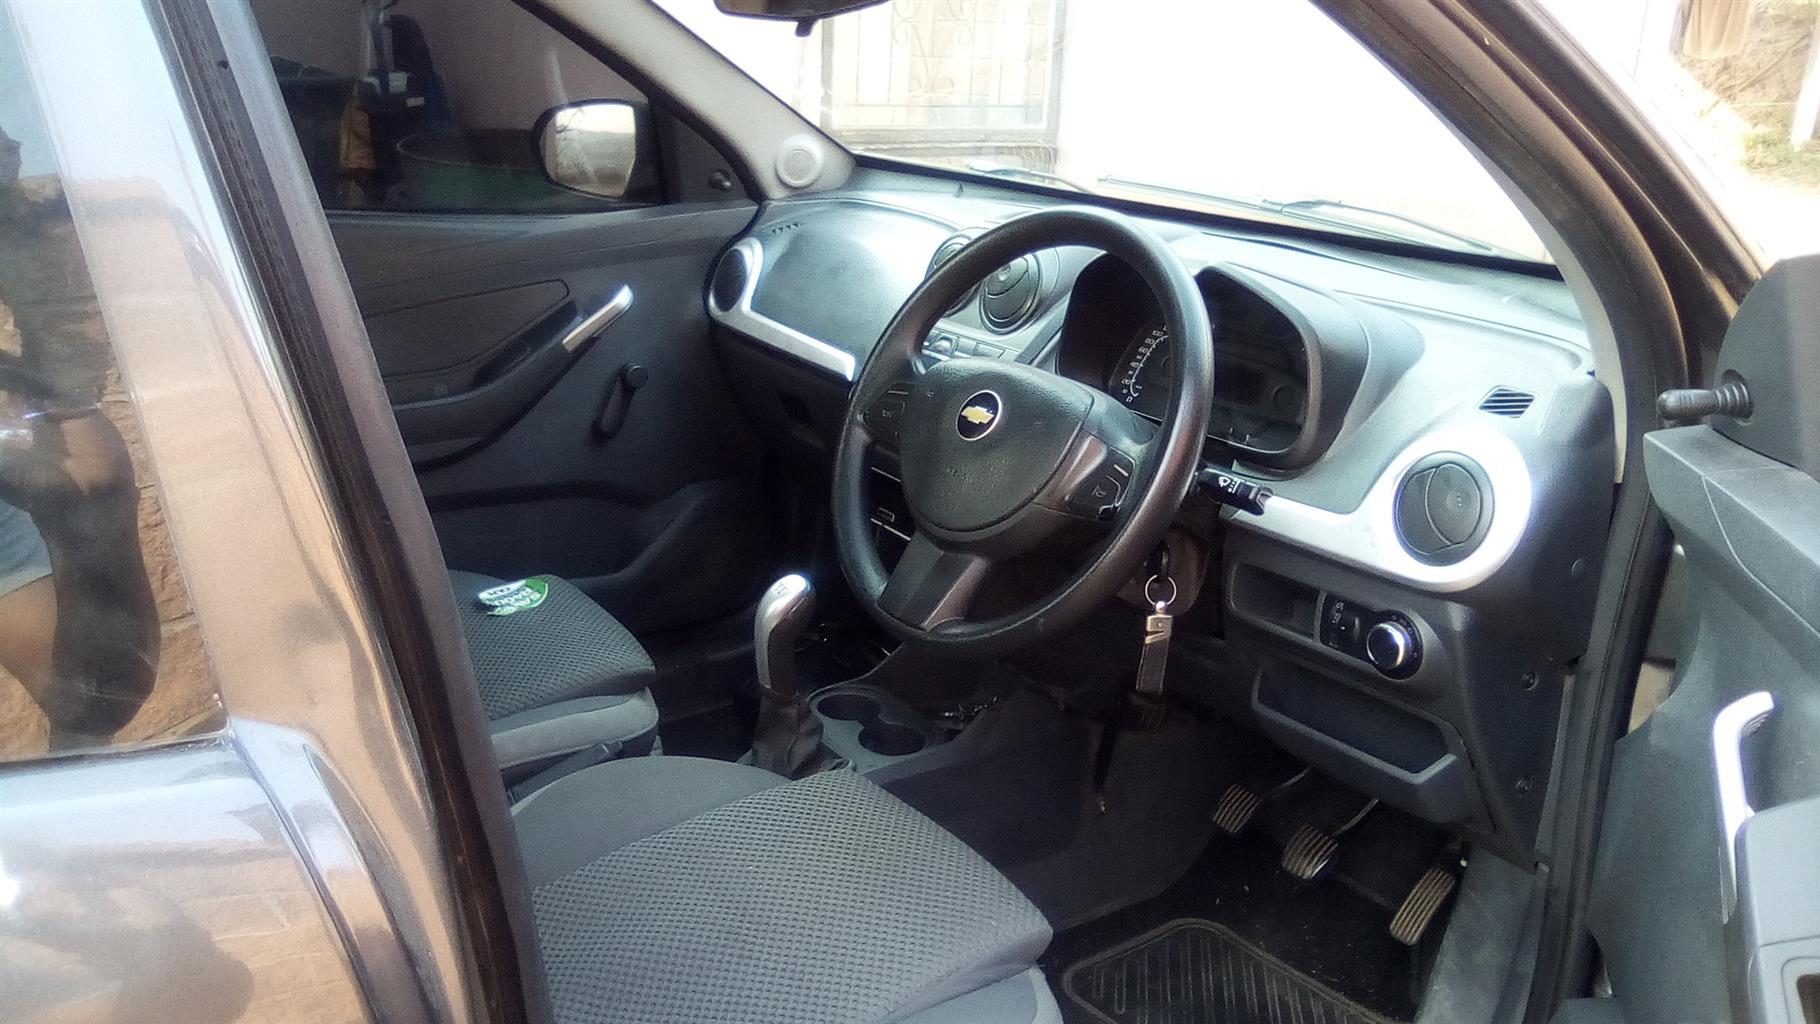 2015 Chevrolet Corsa Utility 1.4